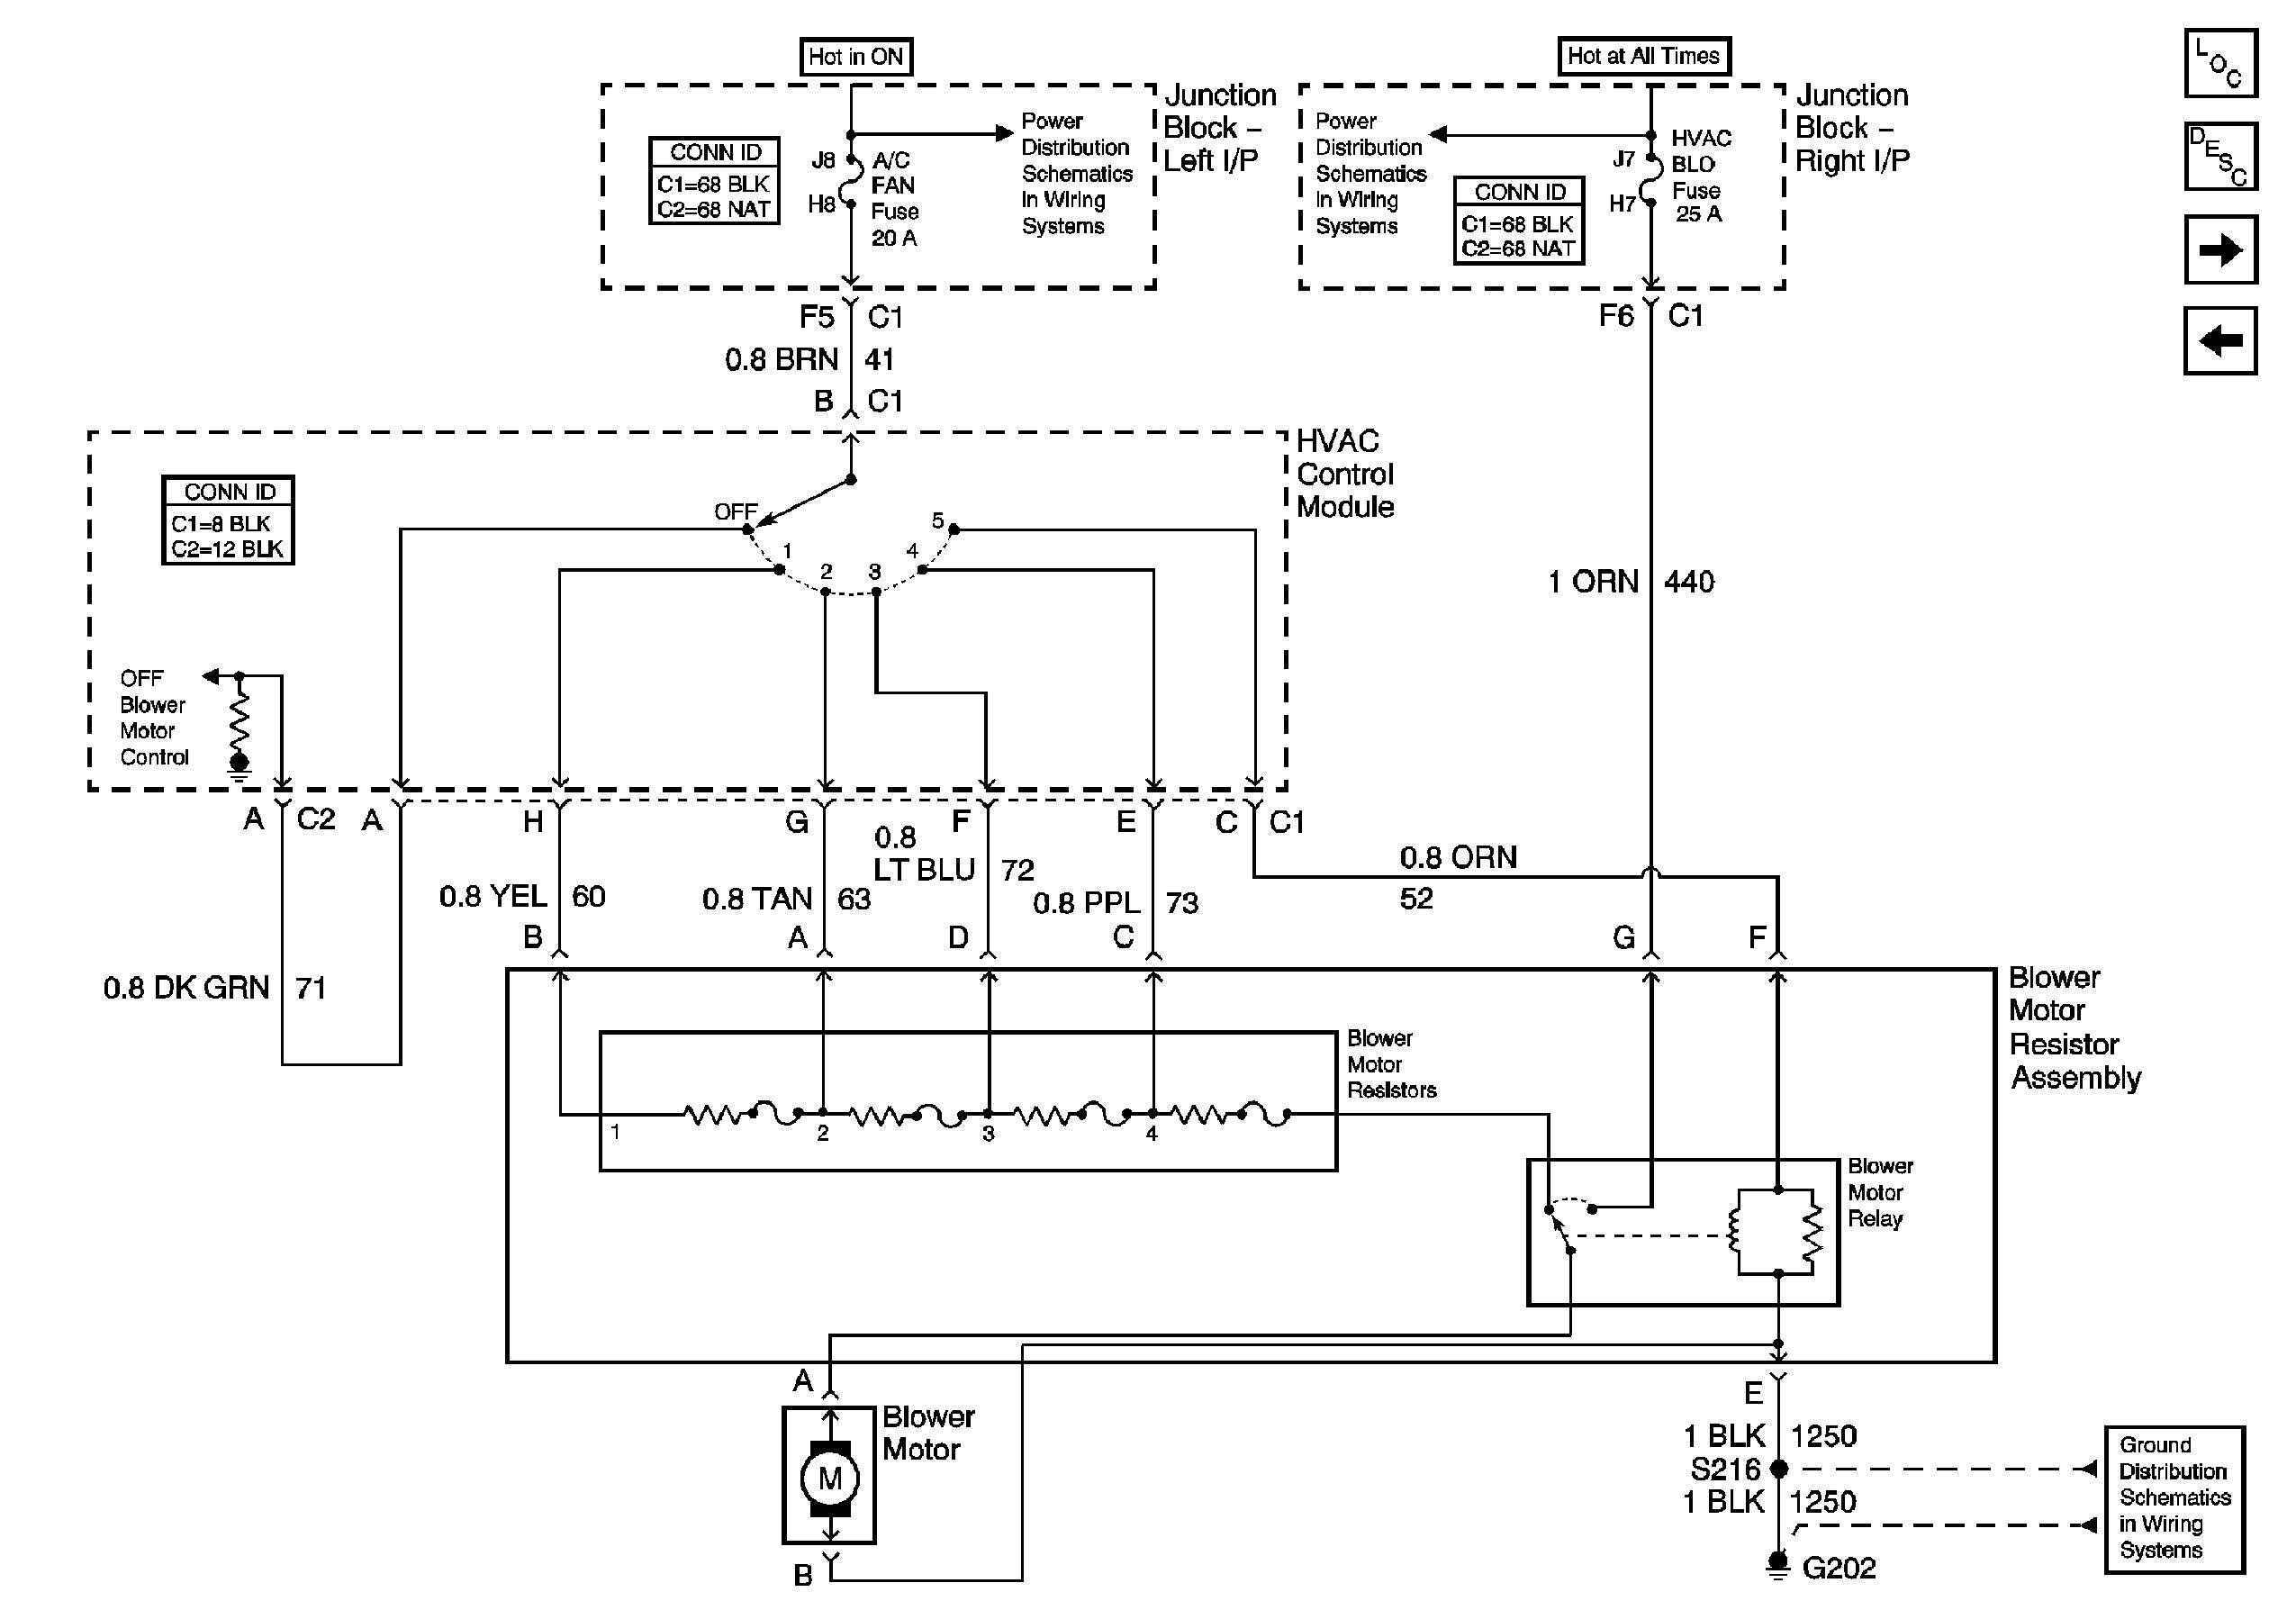 Dodge Ram 1500 Wiring Diagram Free - Wiring Diagram For Lincoln 225 Welder  - yamaha-phazer.deco-doe5.decorresine.itWiring Diagram Resource